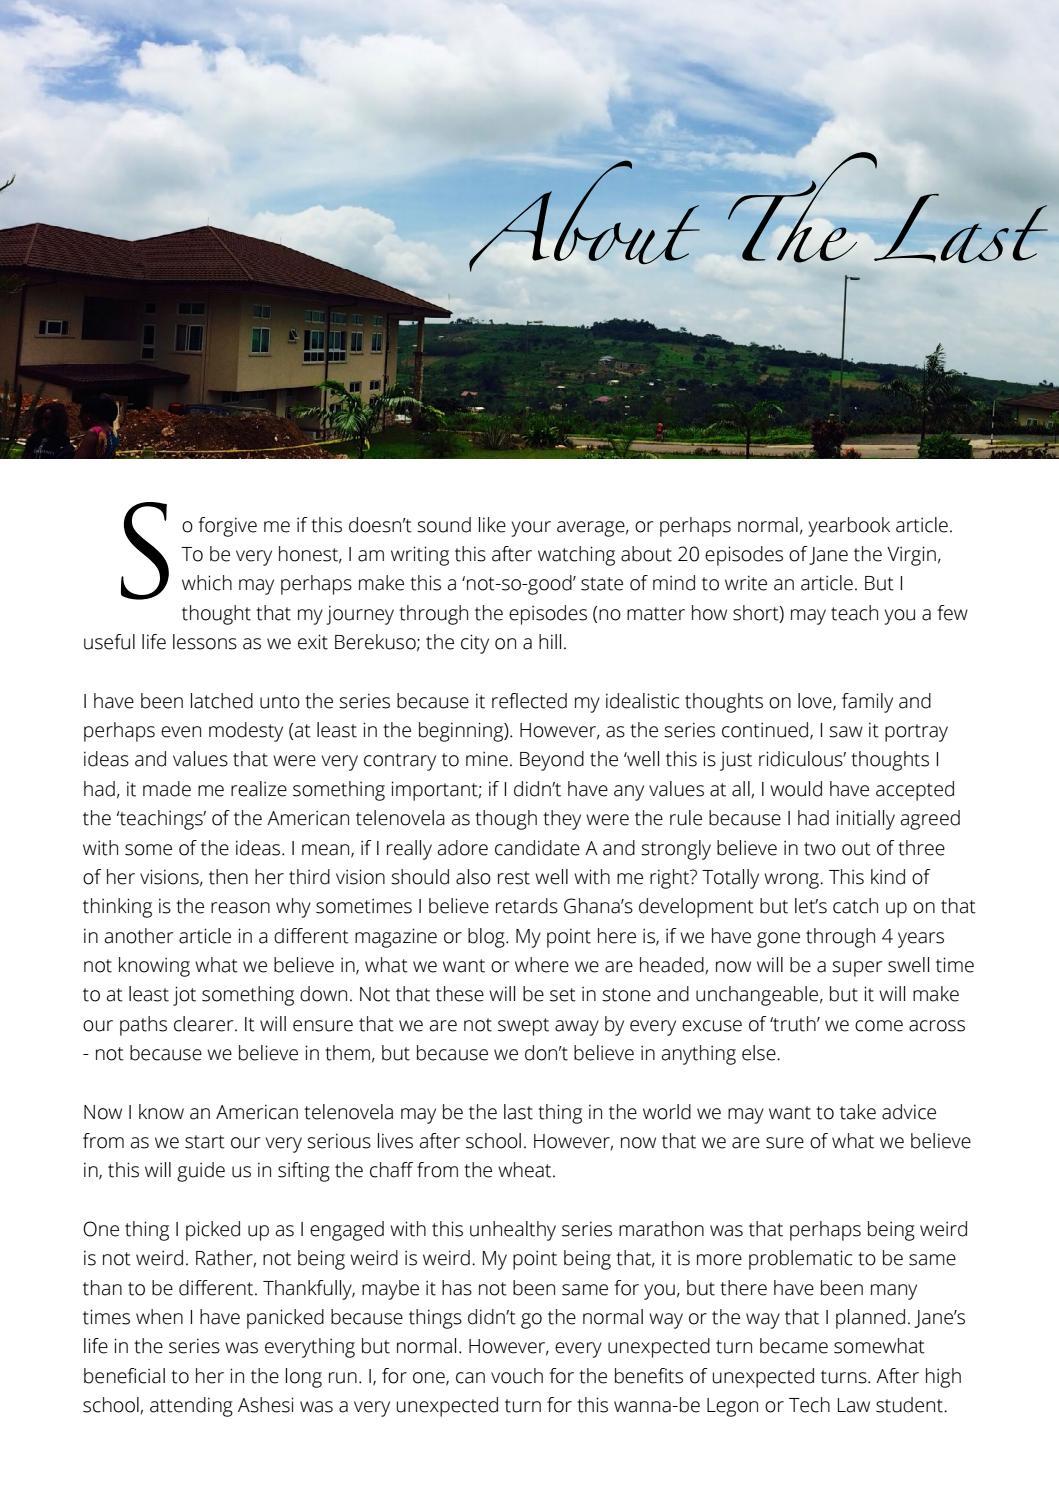 Ashesi Class of 2017 Senior Yearbook by Ashesi Yearbook - issuu